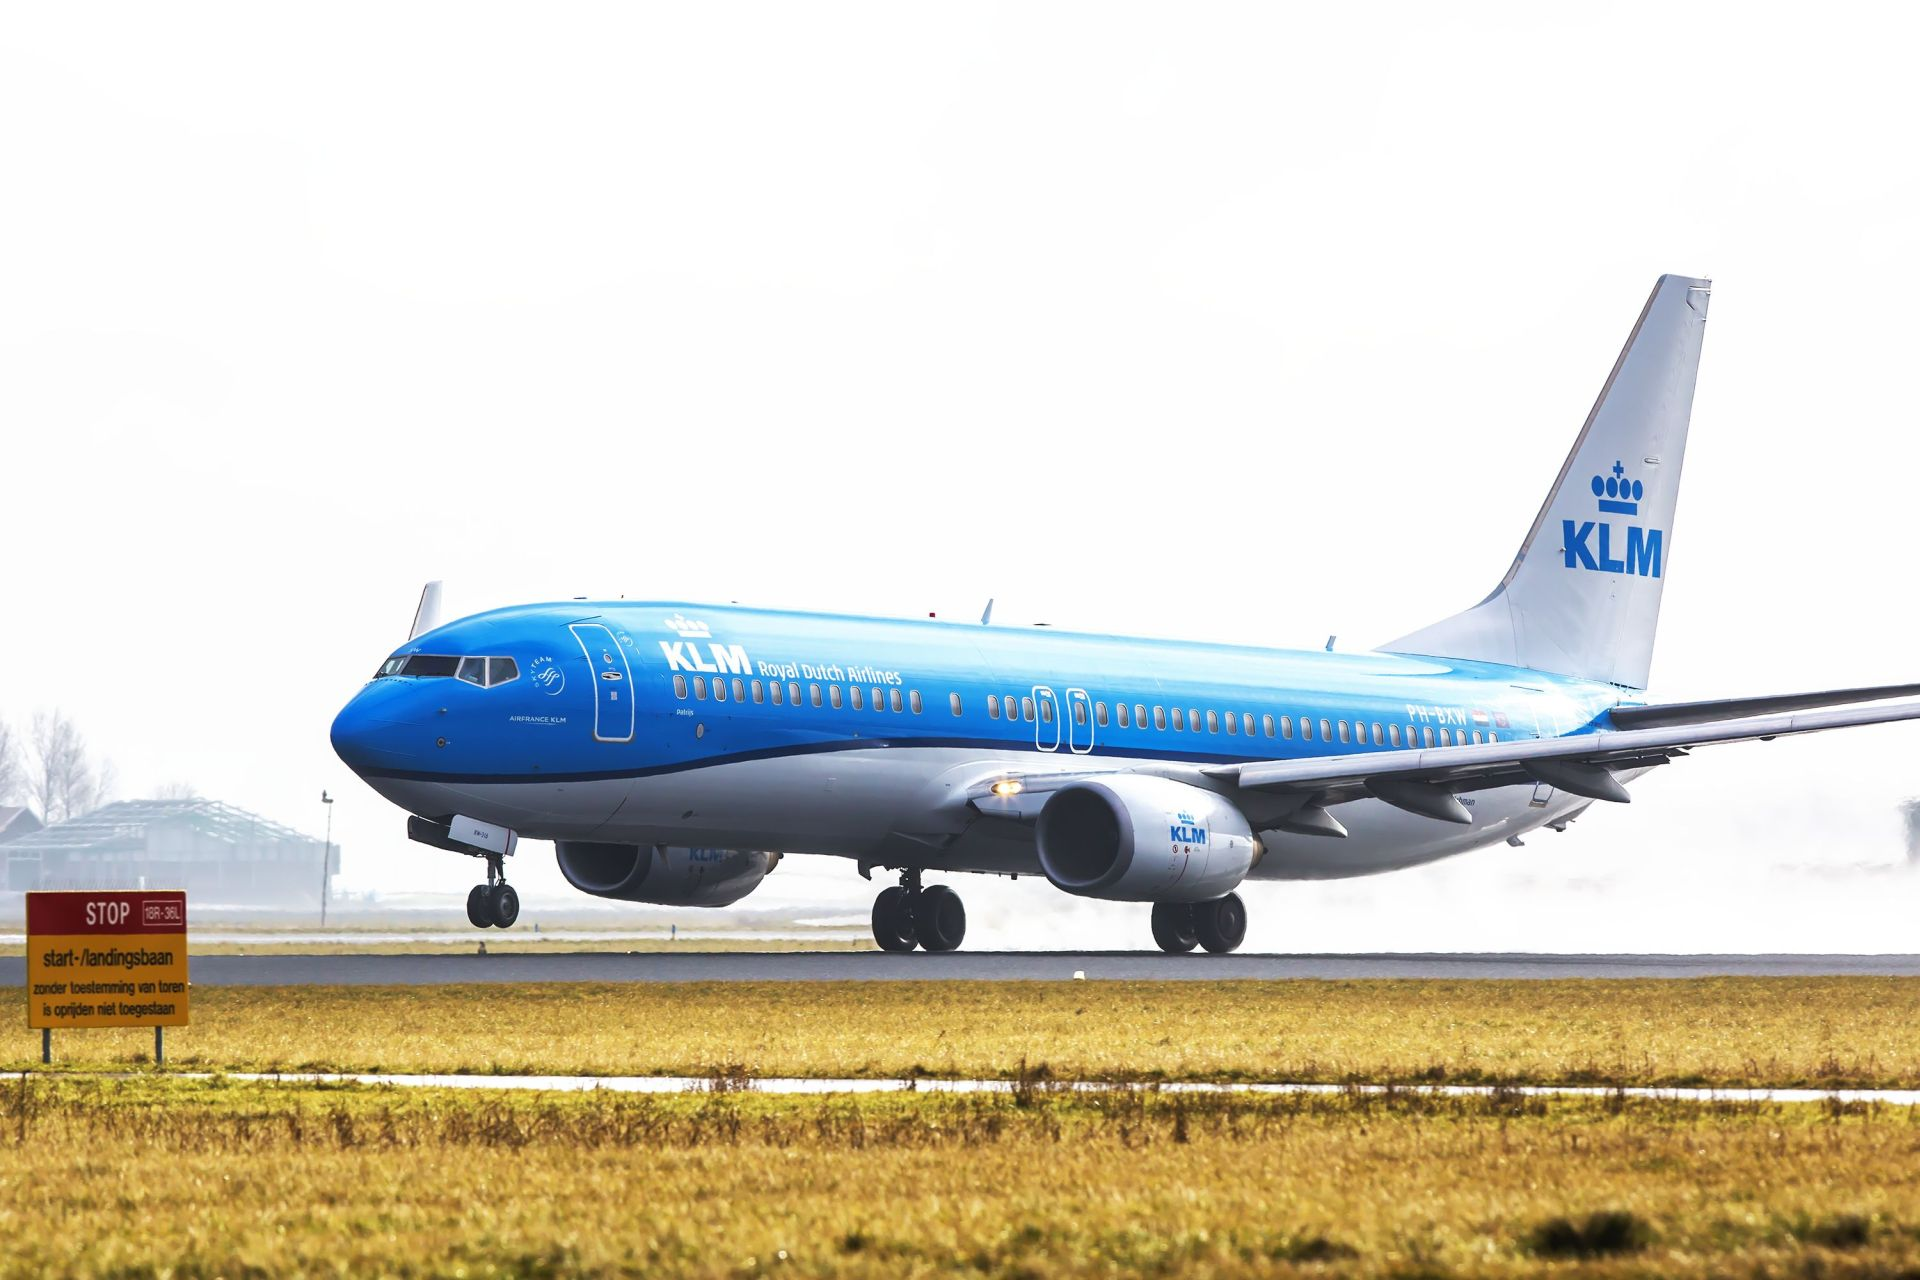 Boeing 737-800 společnosti KLM. Foto: KLM